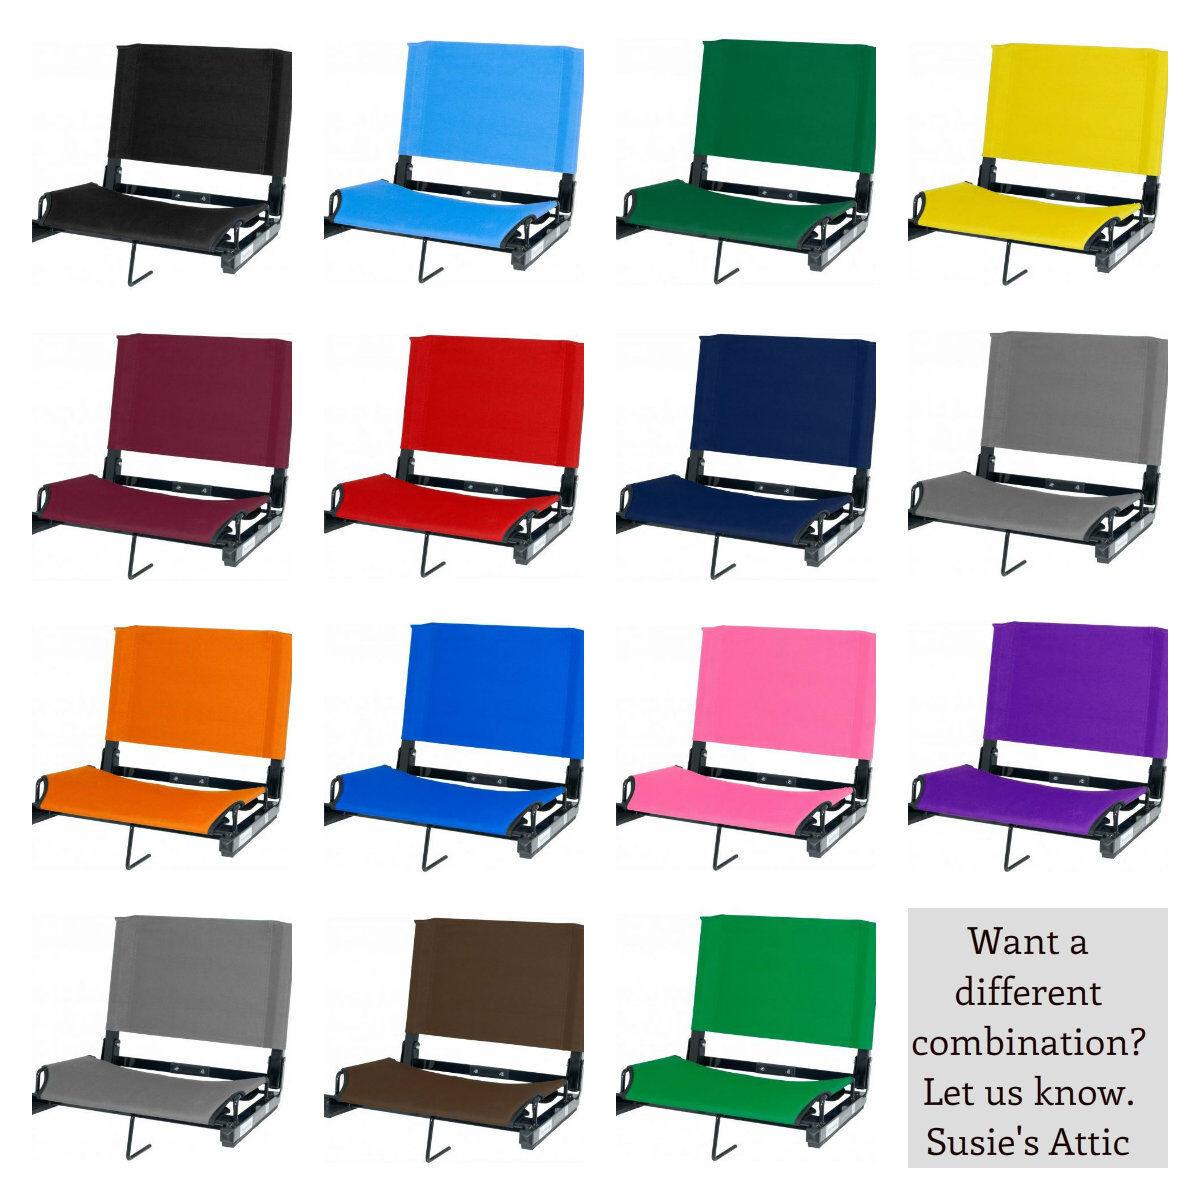 Bleacher Seats With Backs Stadium Chair Cushion Deluxe 17 Wide sport HD Var